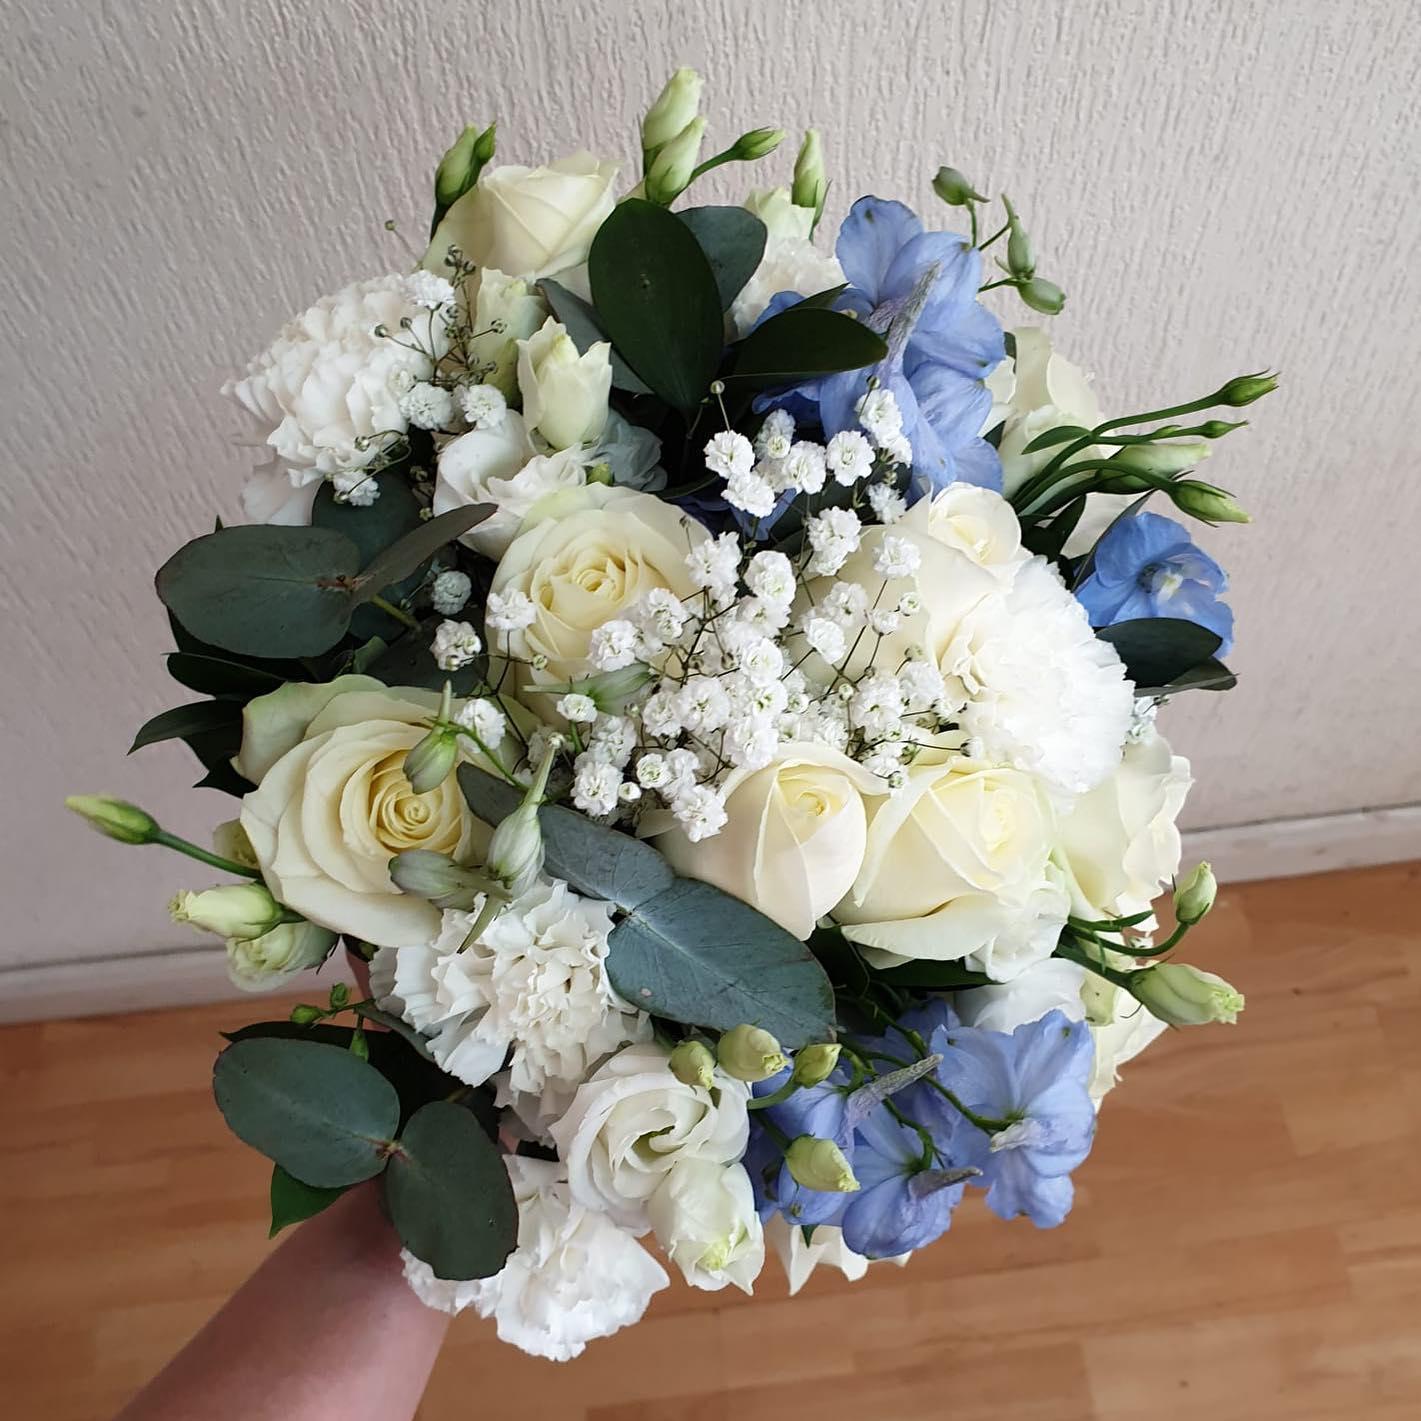 Cream Rose & Pale Blue Delphinium Bride's Bouquet